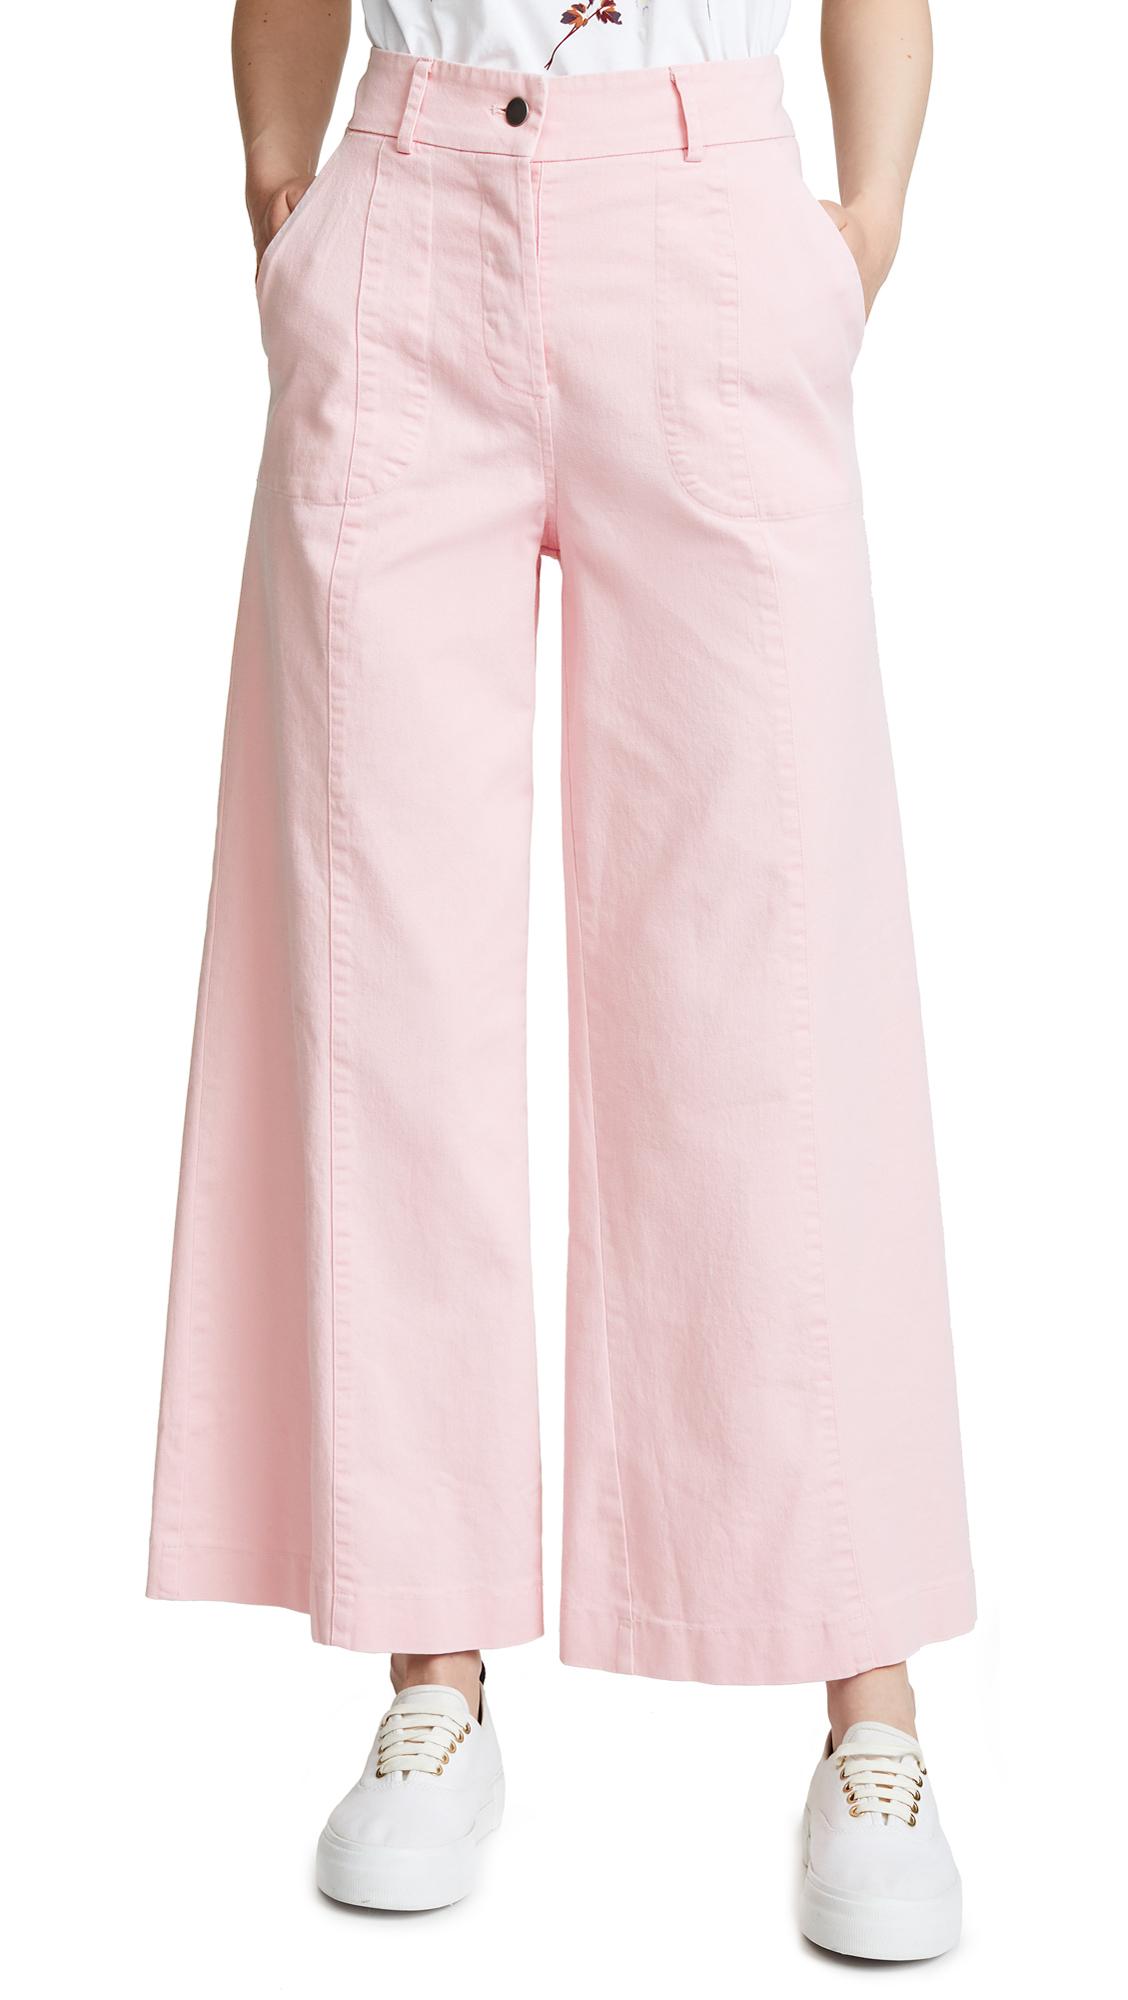 LOUP Pink Julia Jeans